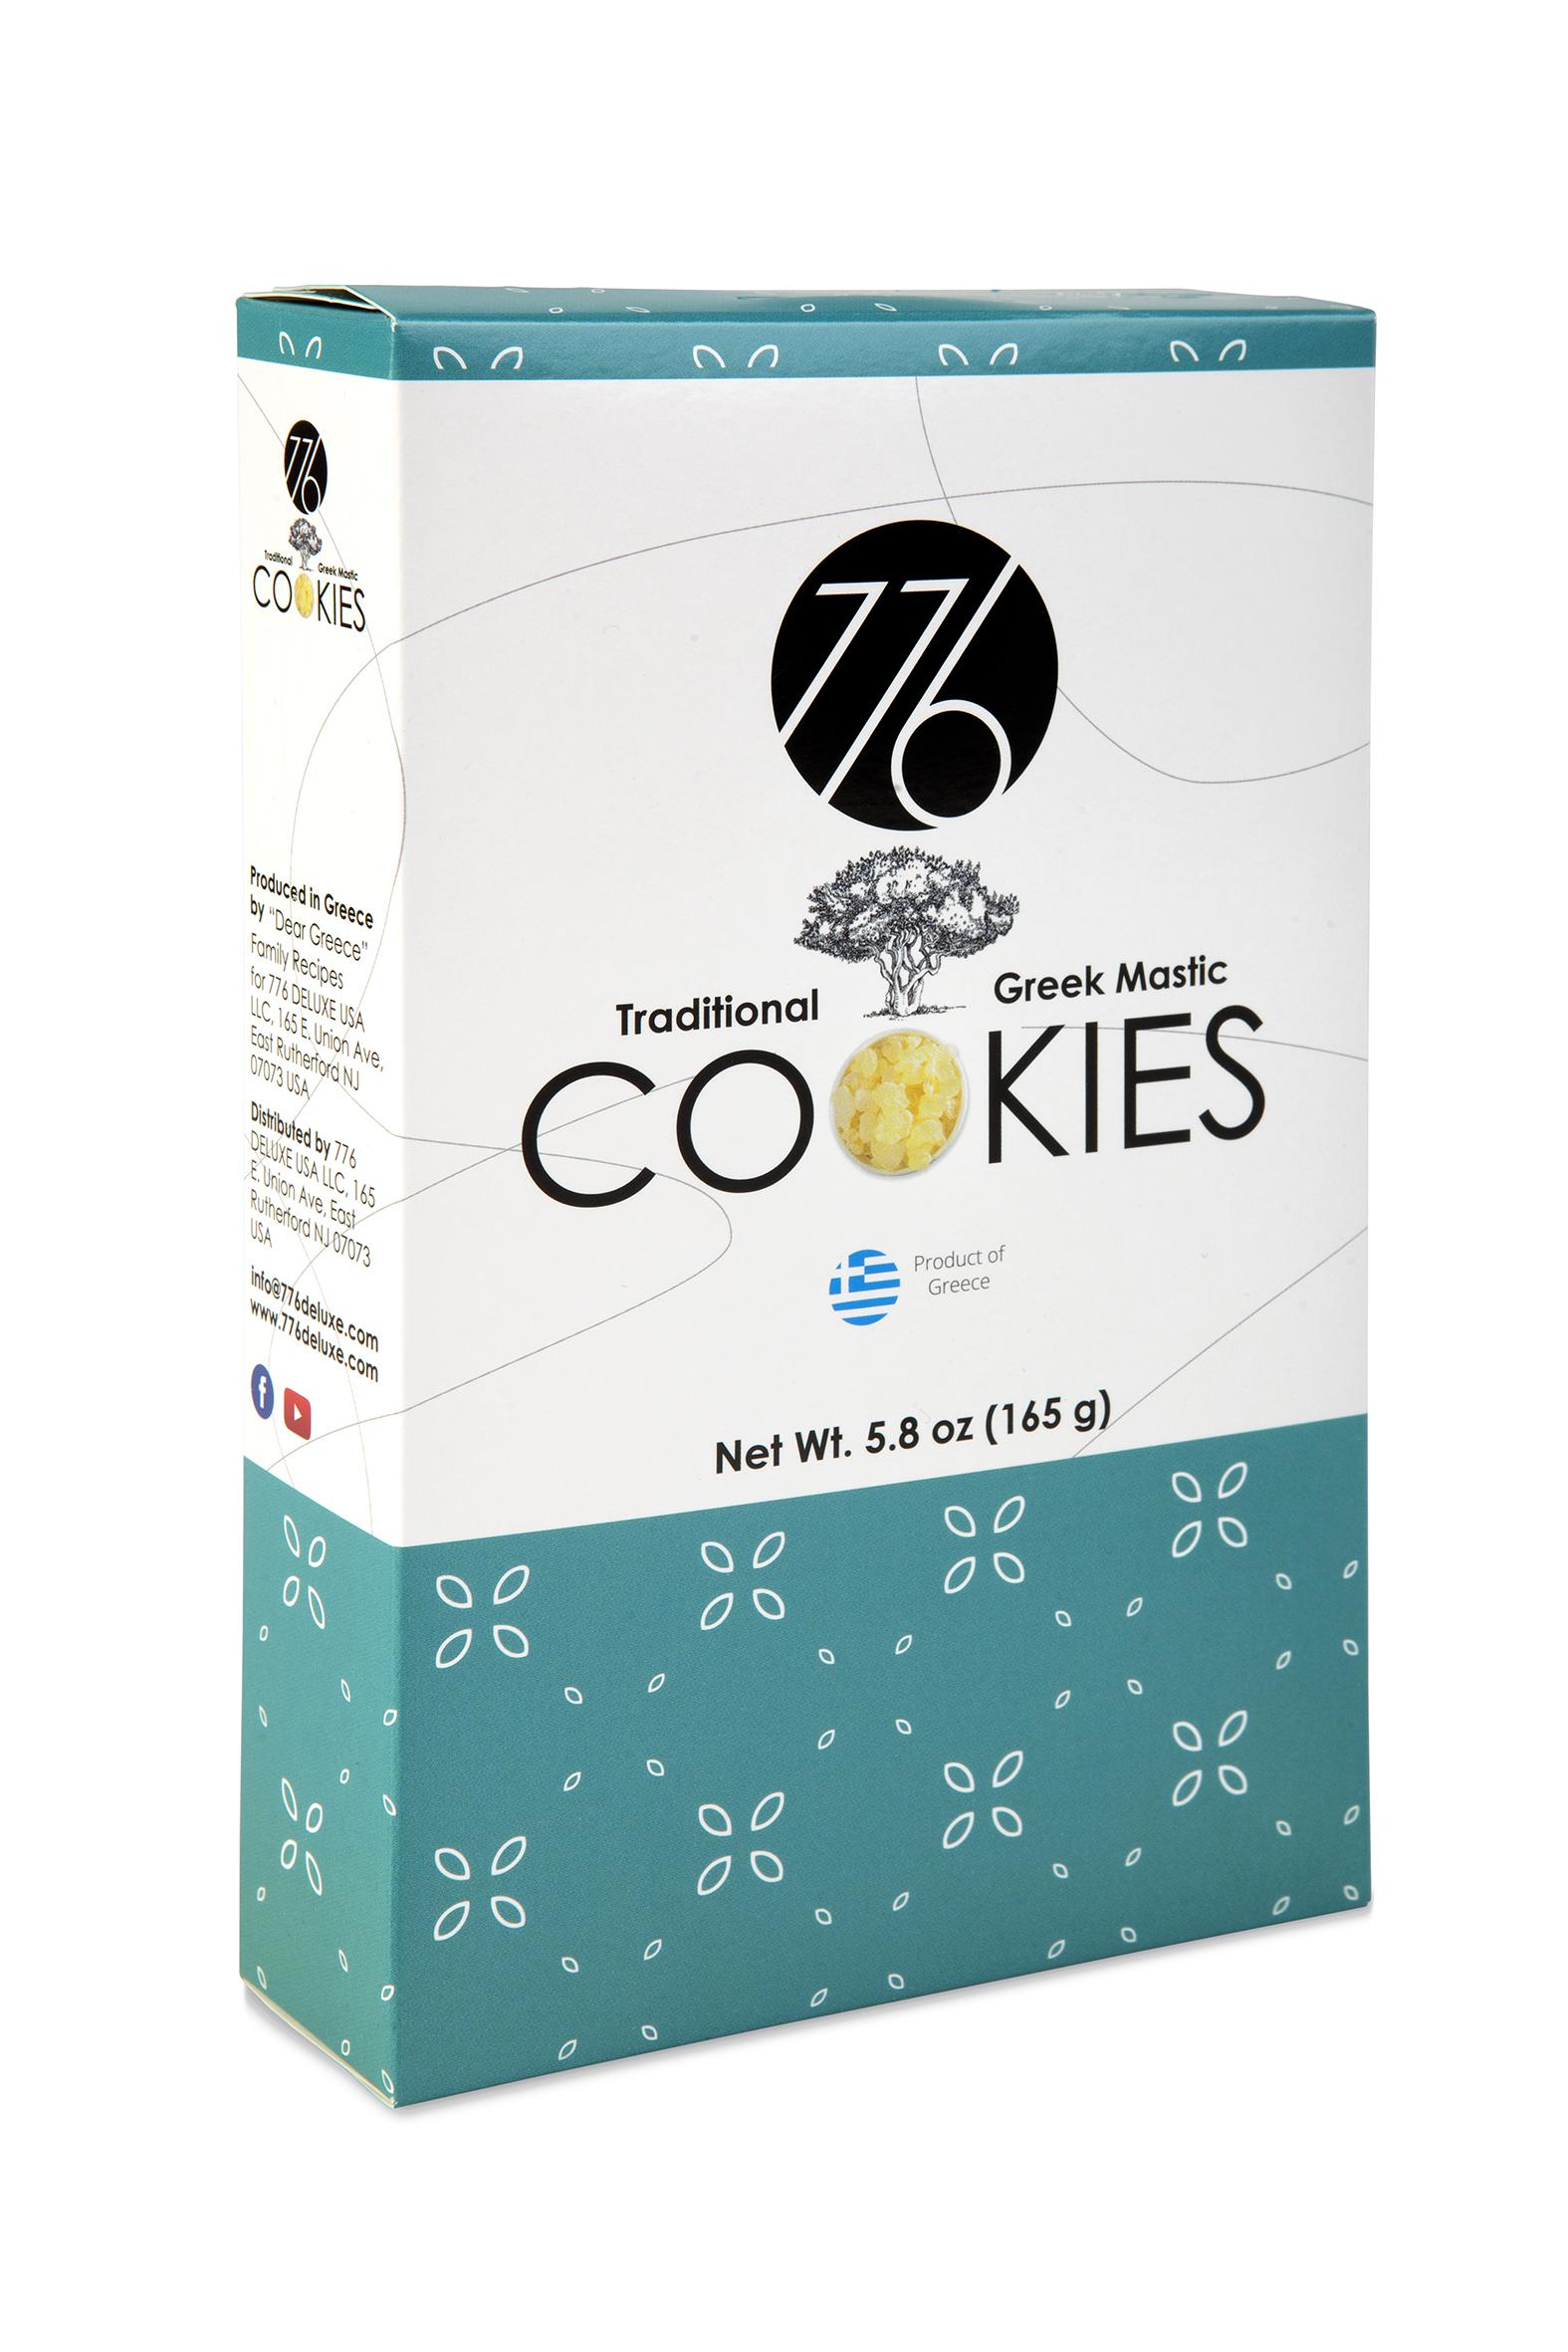 Traditional Greek Mastic Cookies